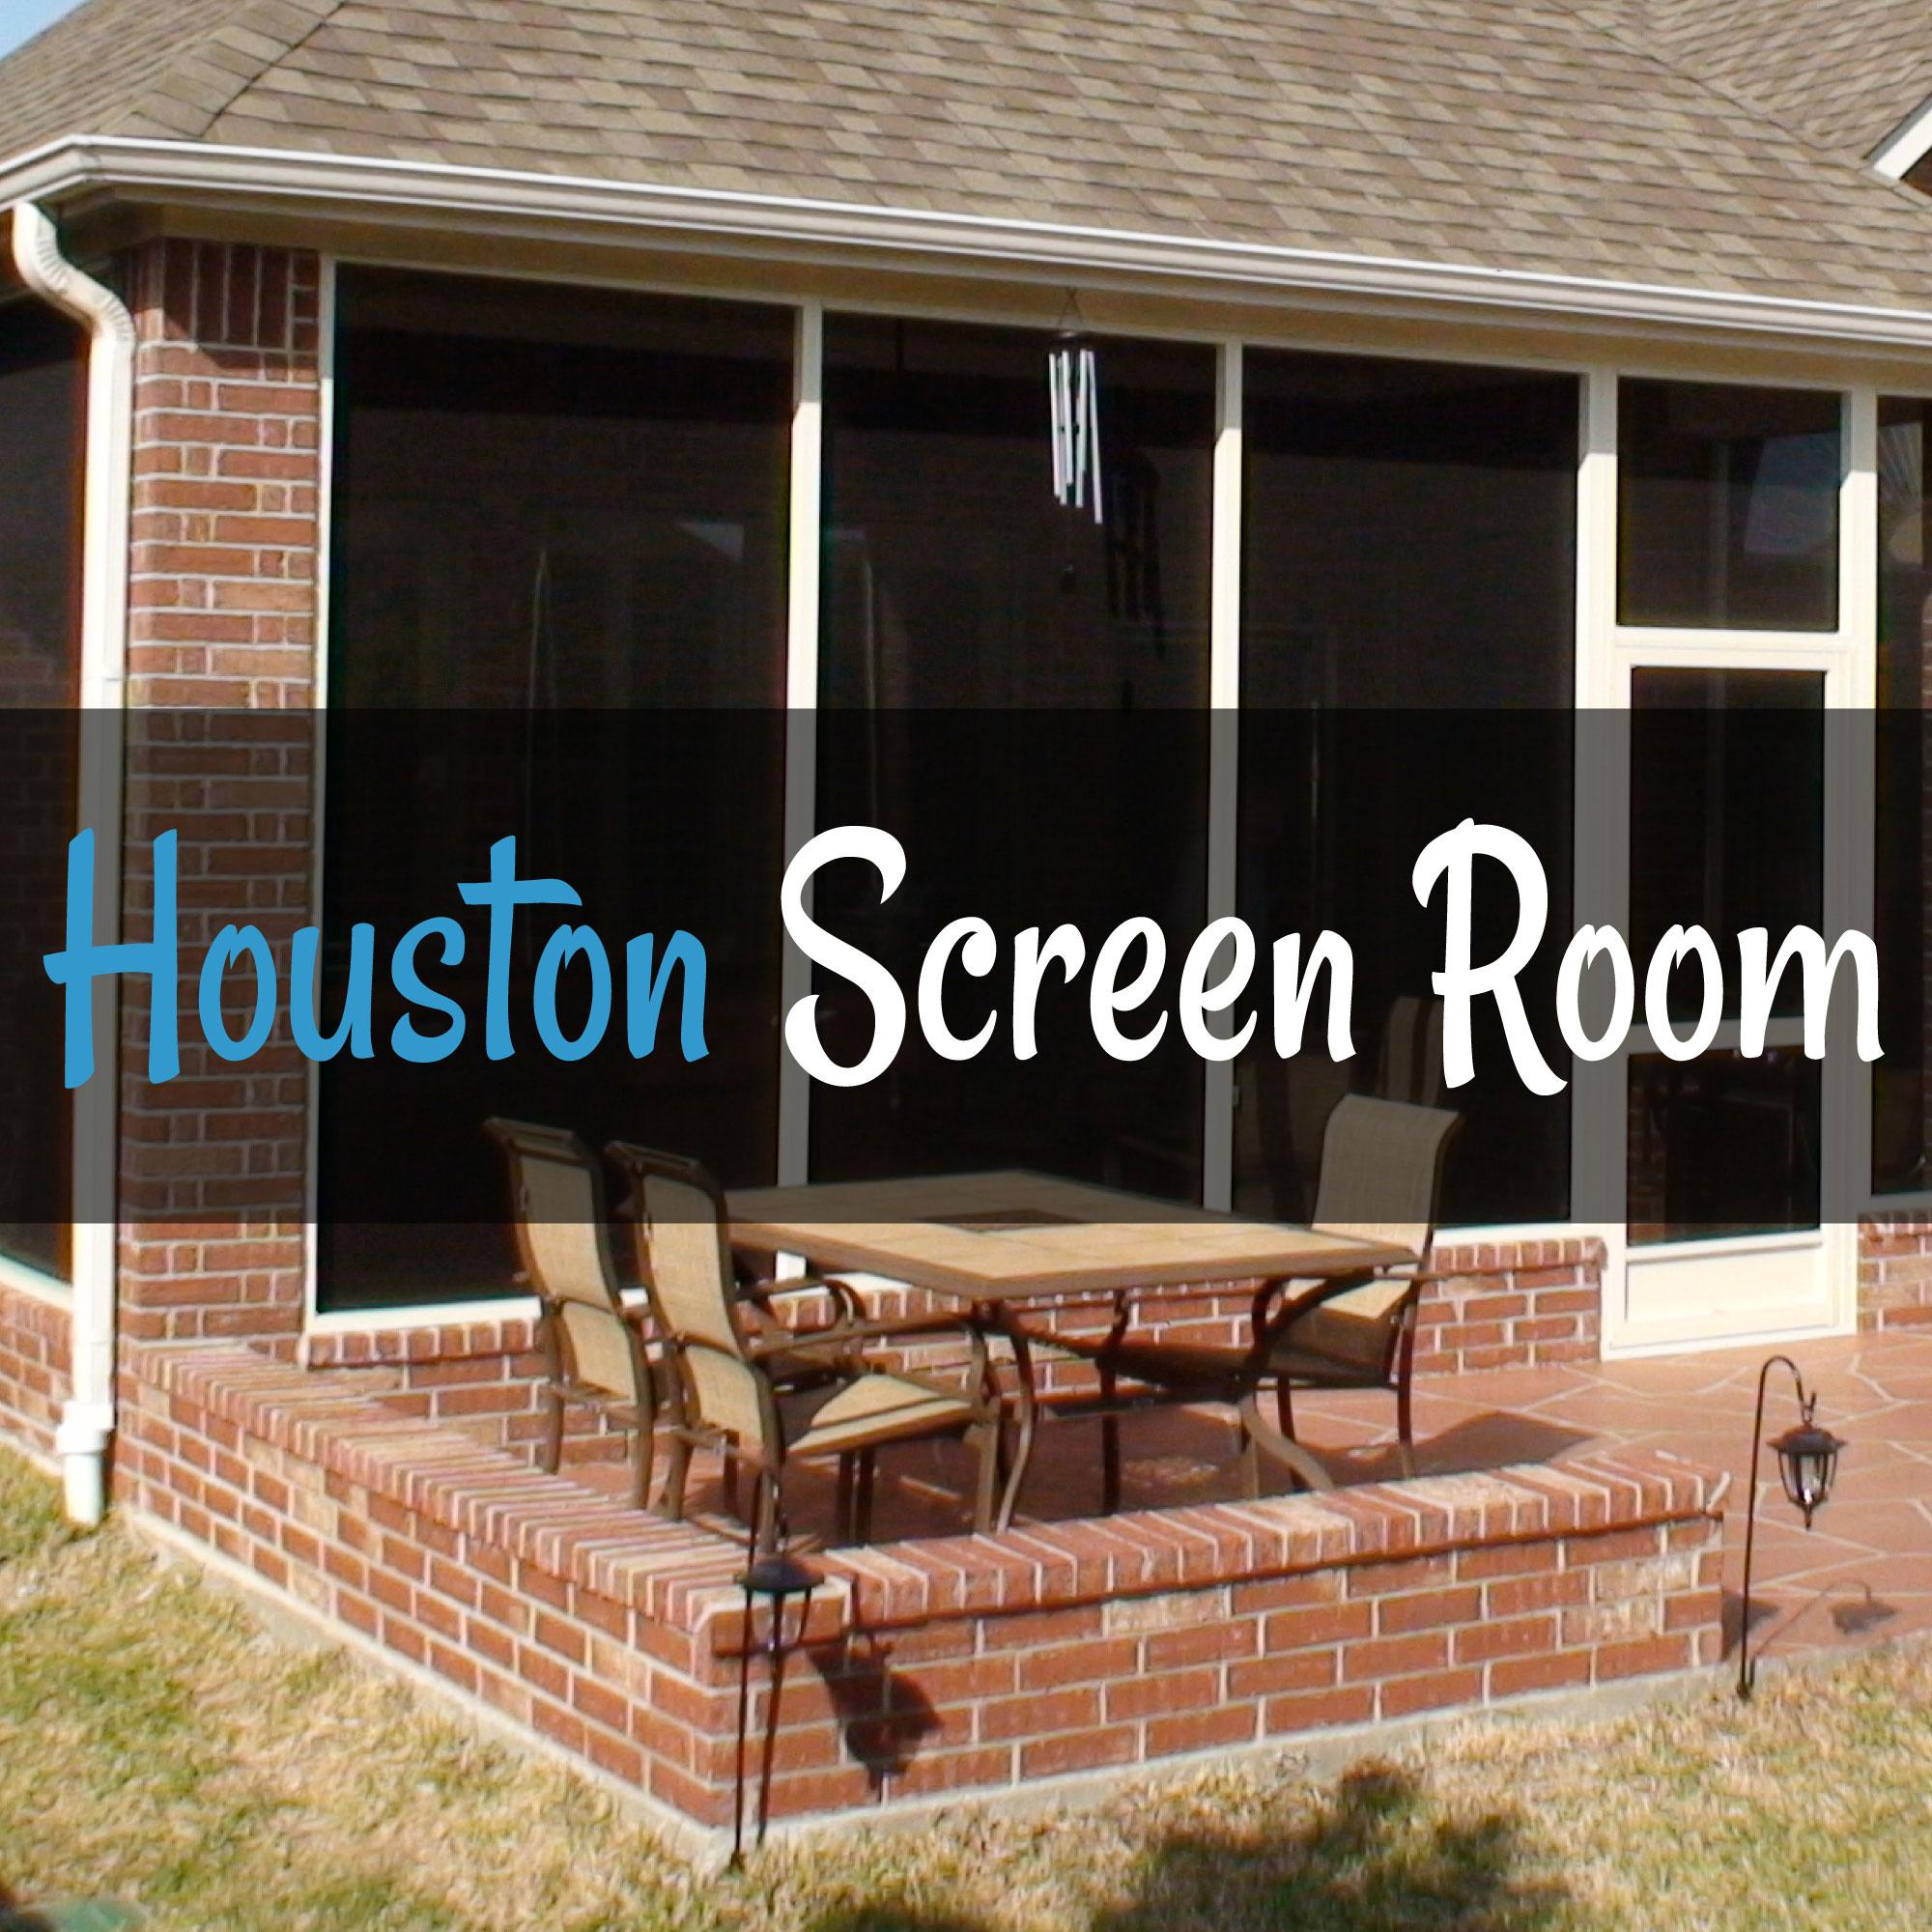 Houston-Screen-Room-FB-Profile.jpg